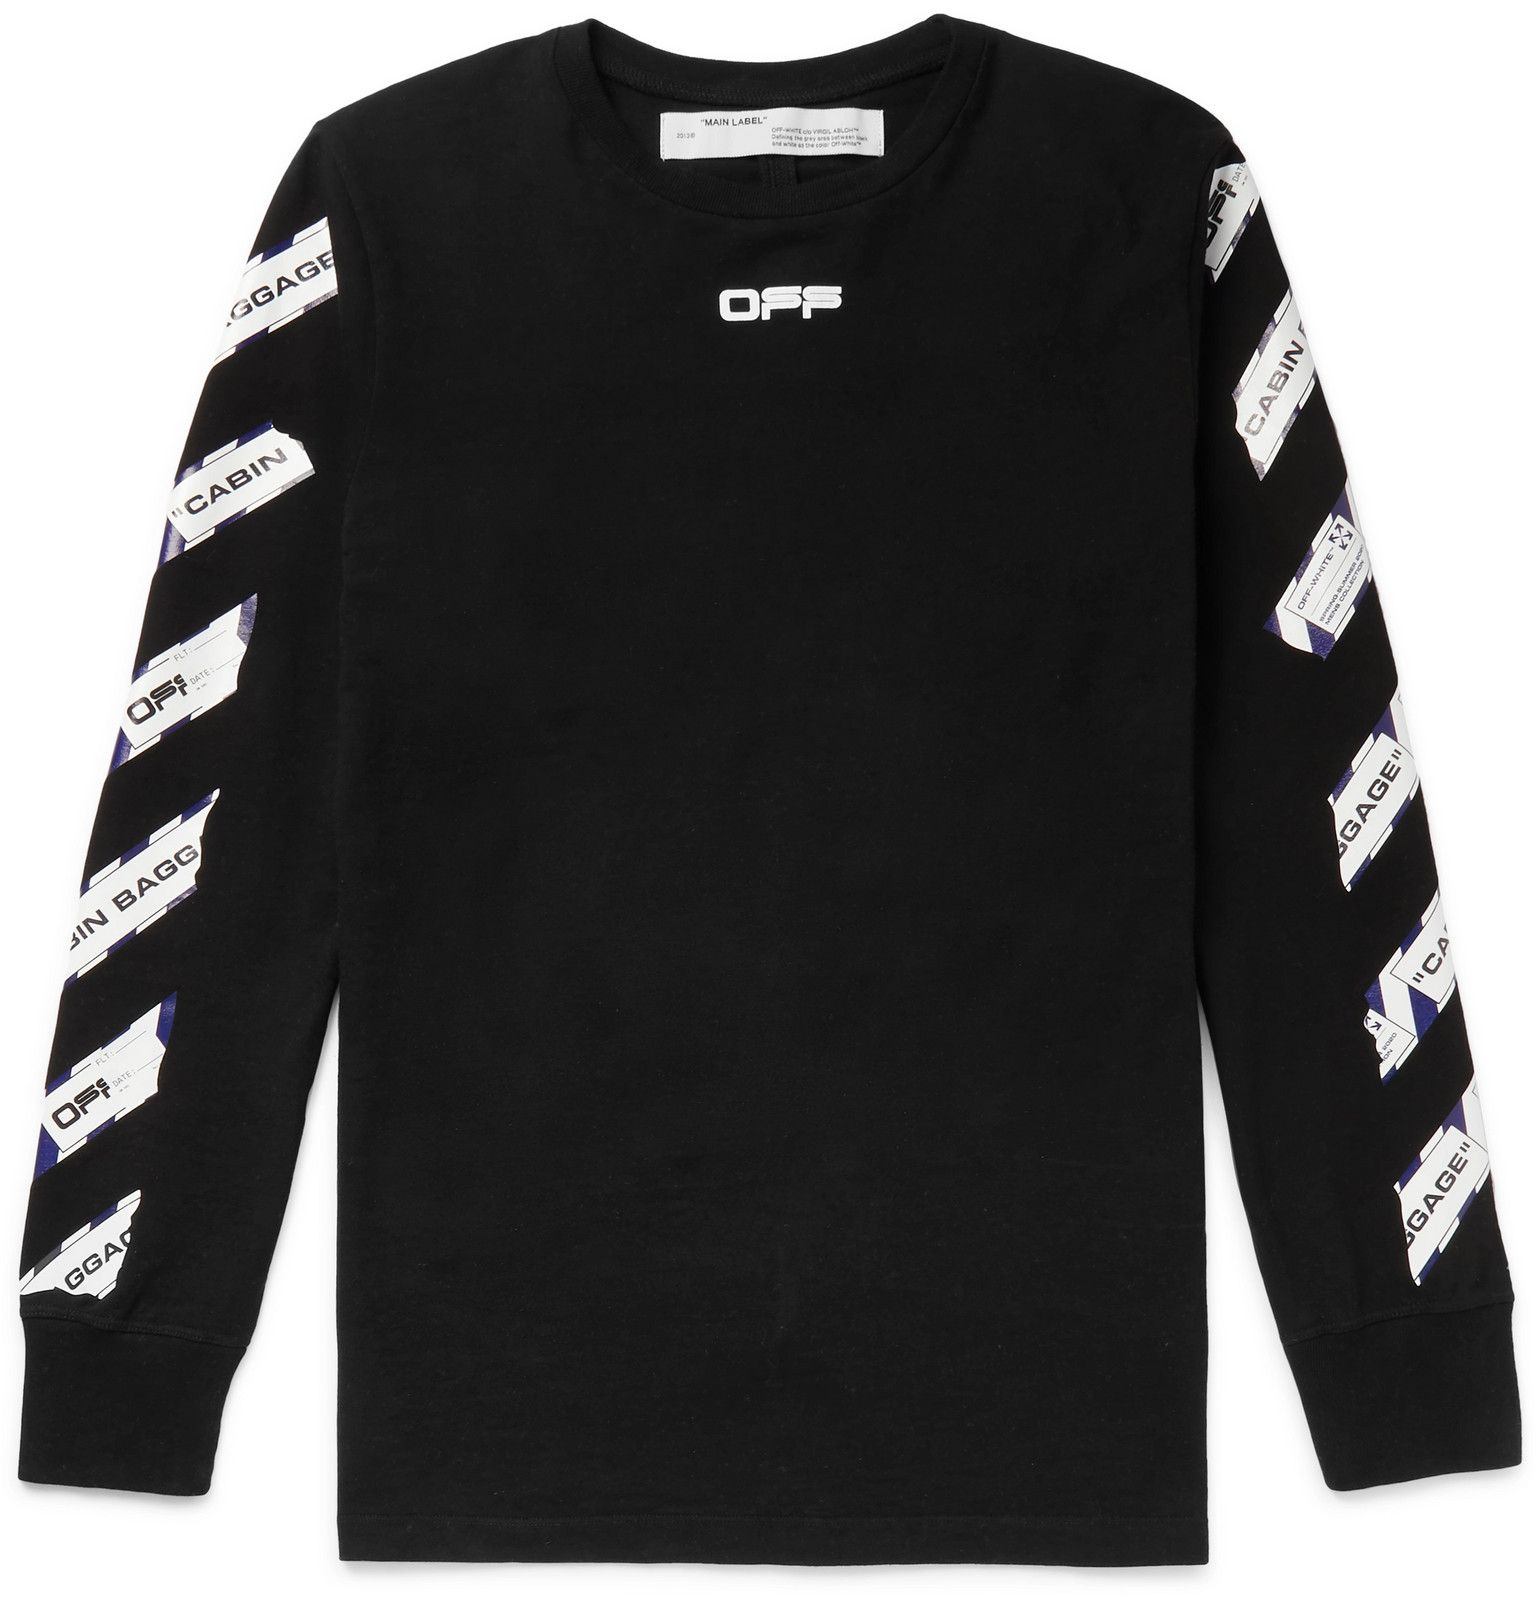 Off White Printed Cotton Jersey T Shirt Men Black Hoodie Outfit Men Long Sleeve Tshirt Men Shirts [ 1604 x 1536 Pixel ]